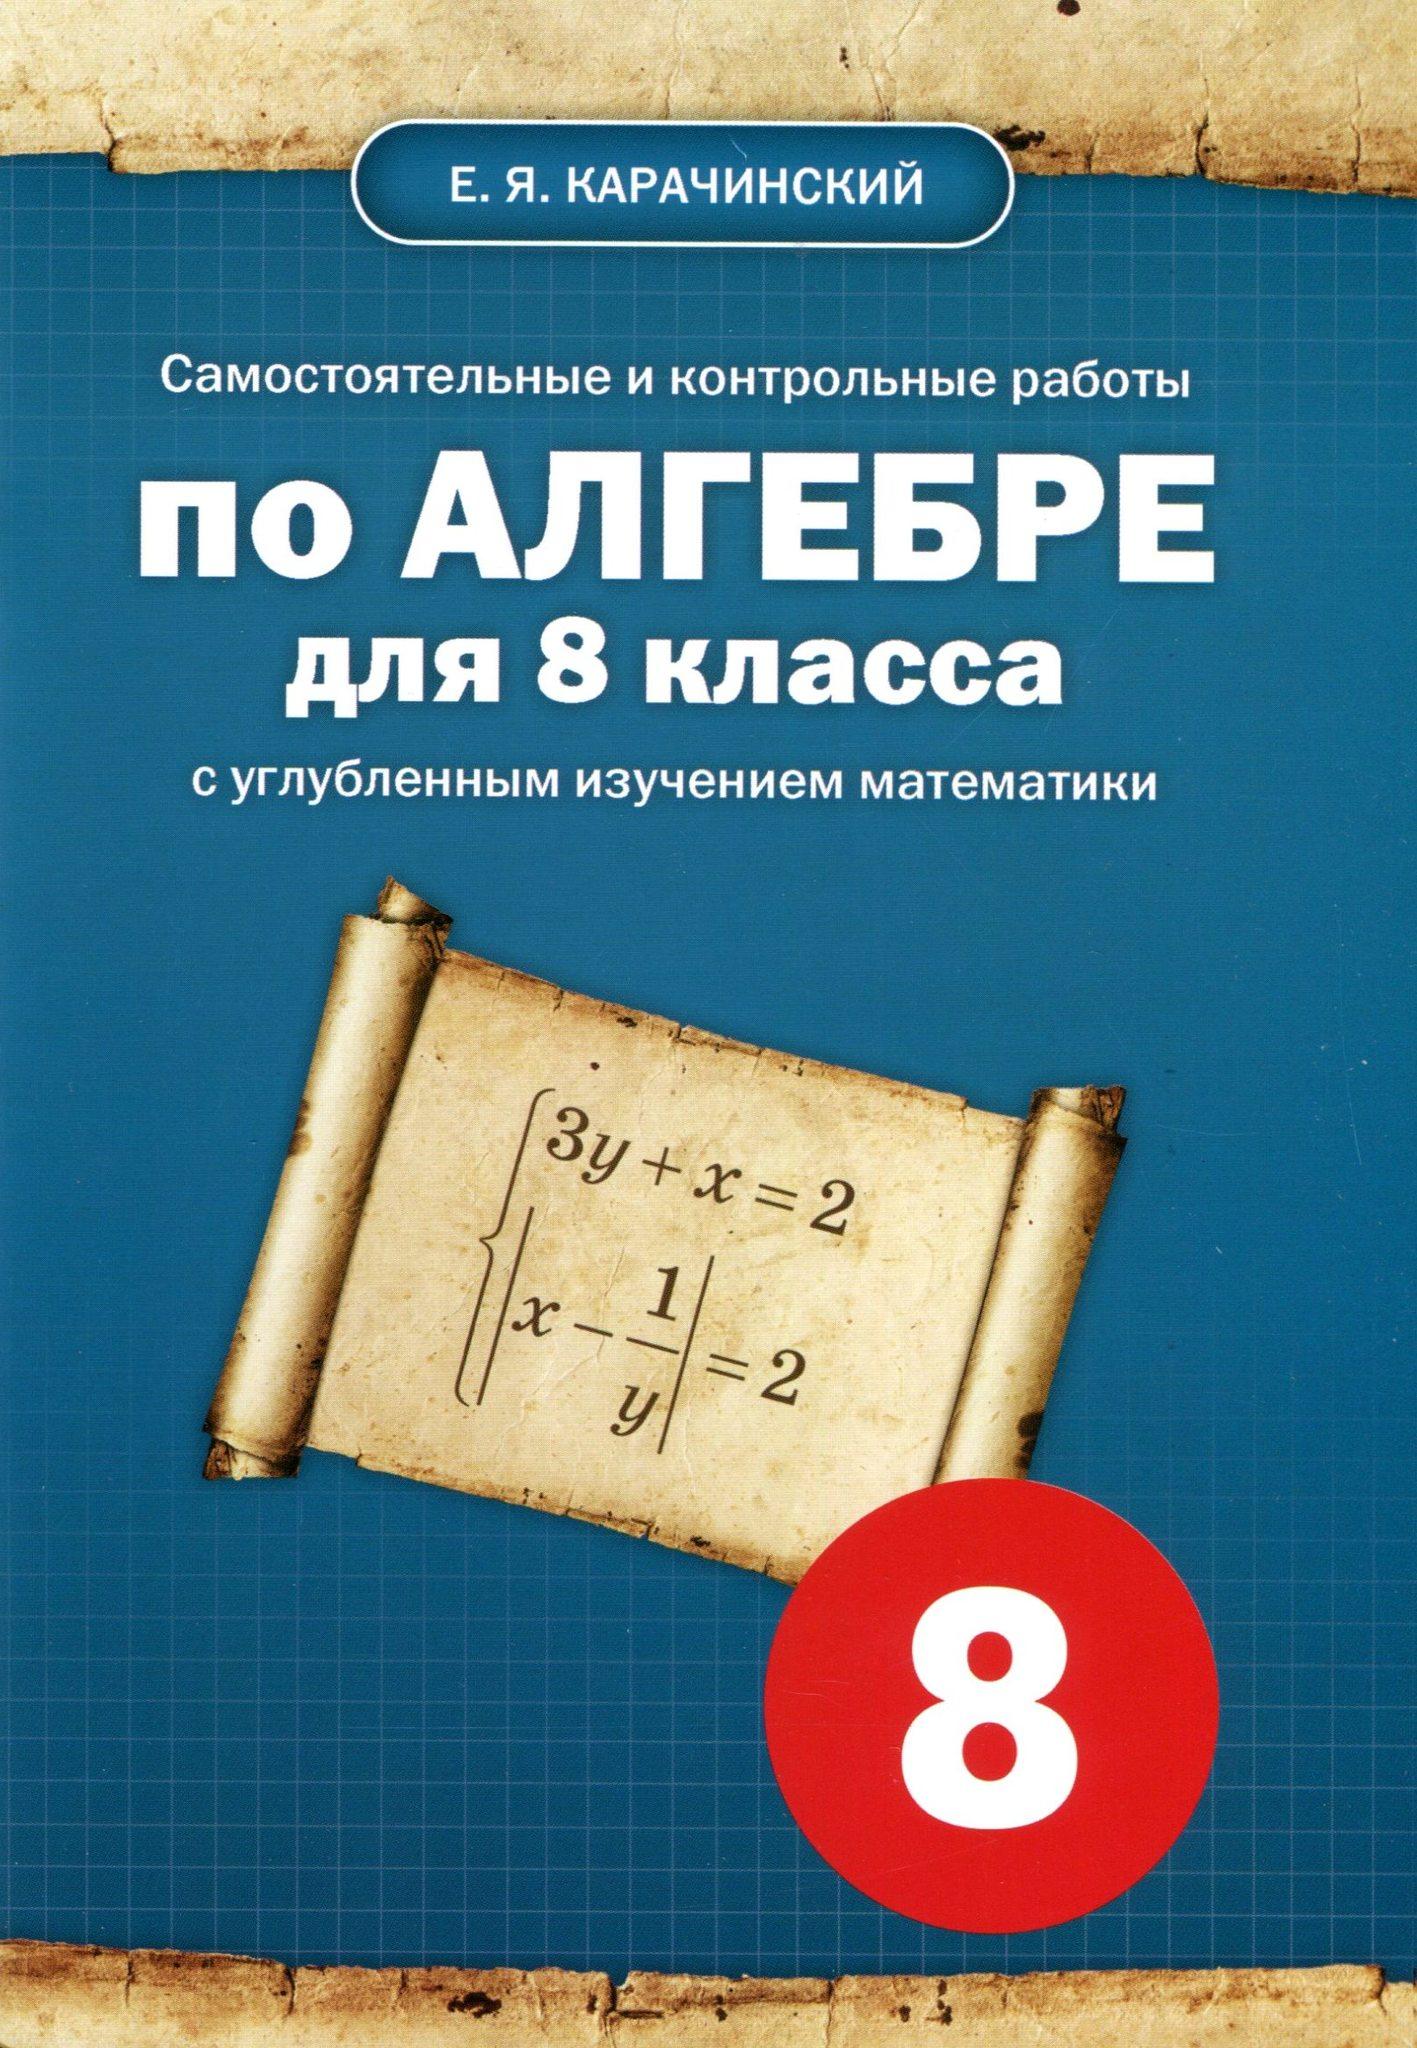 Изучать математику онлайн